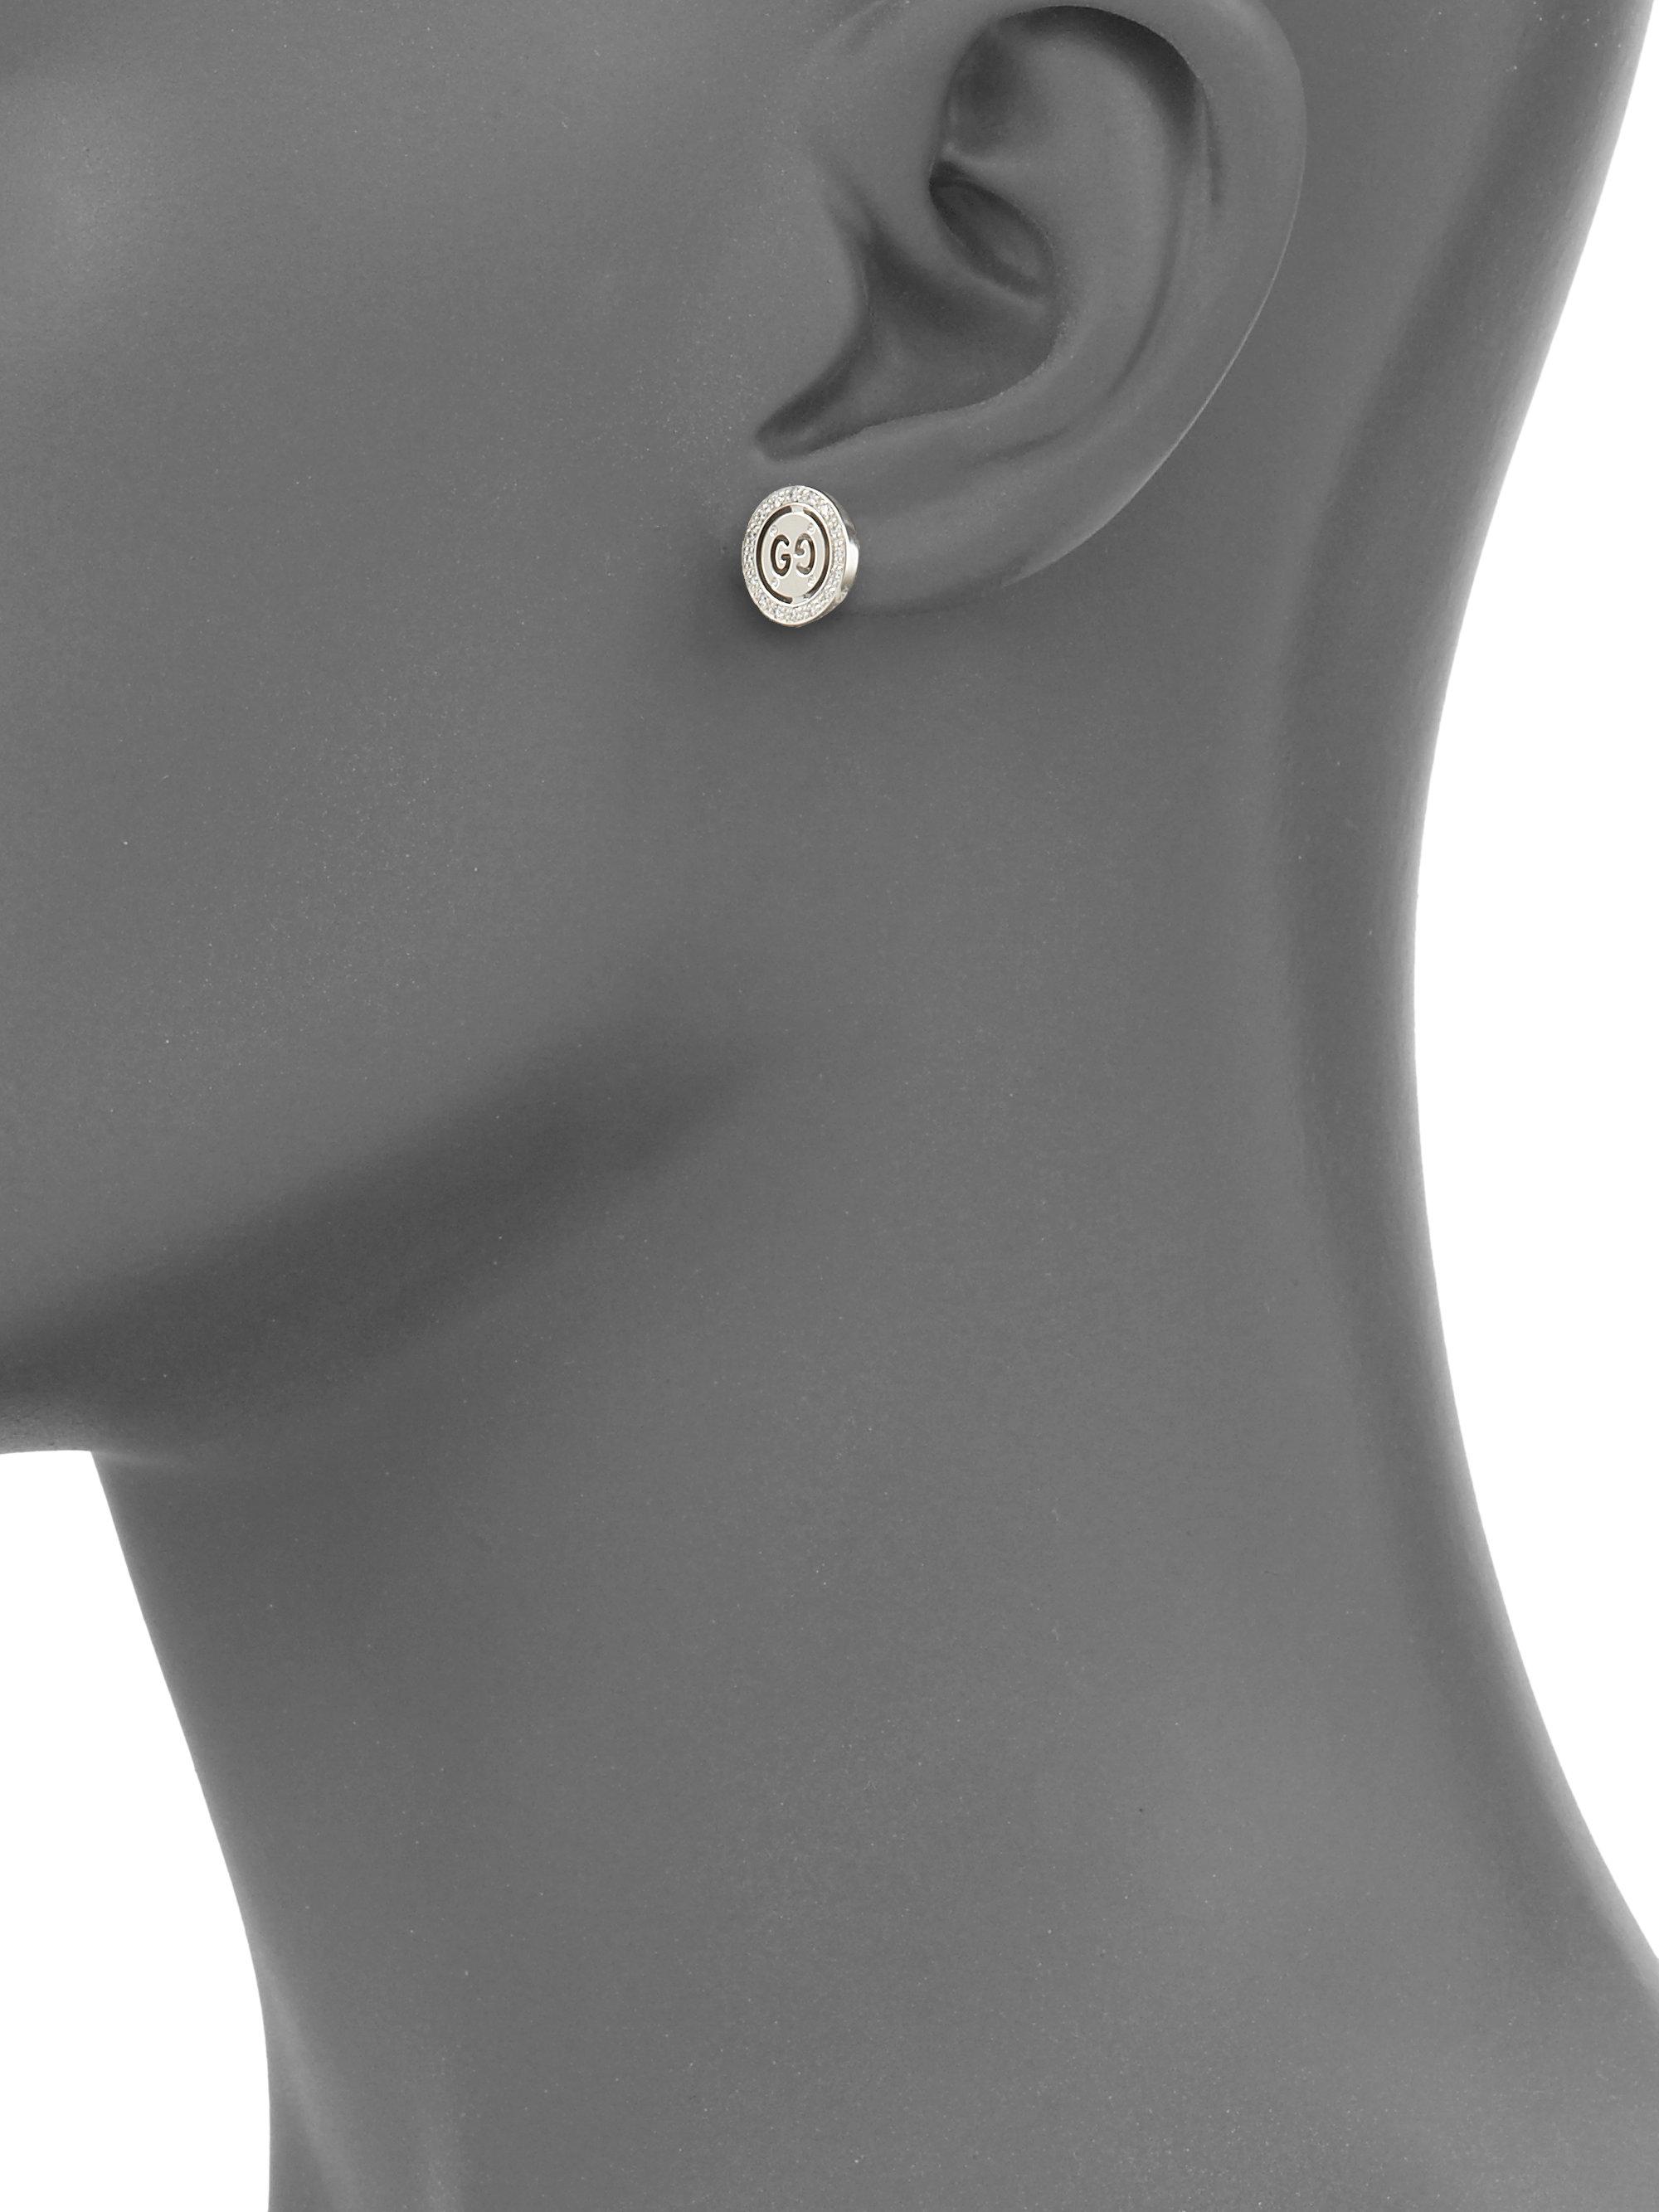 40013bc77ec Gucci Stud Earrings Gold - Best All Earring Photos Kamilmaciol.Com